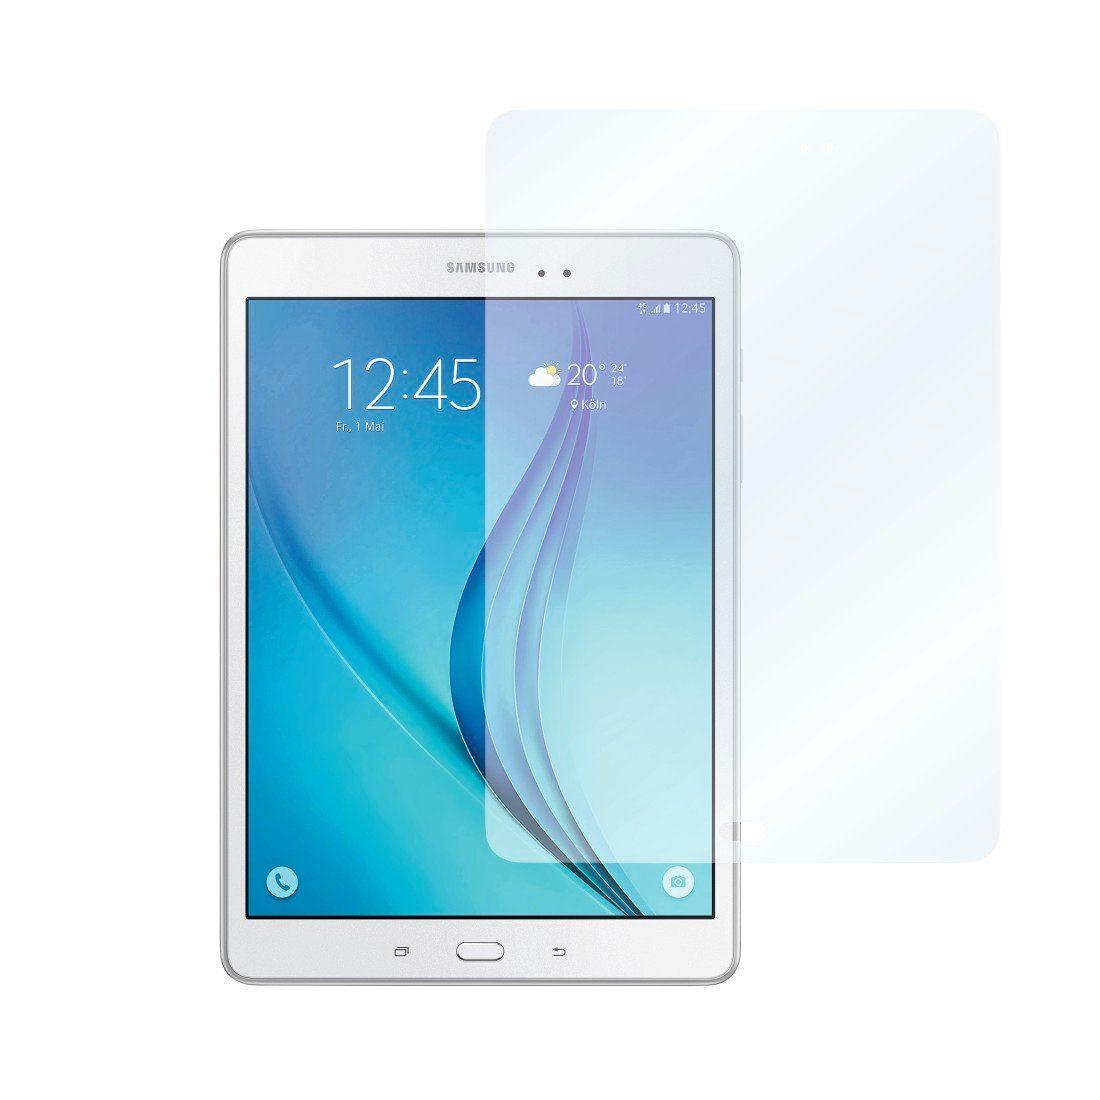 Hama Displayschutzfolie Anti-reflective für Samsung Galaxy Tab A 9.7